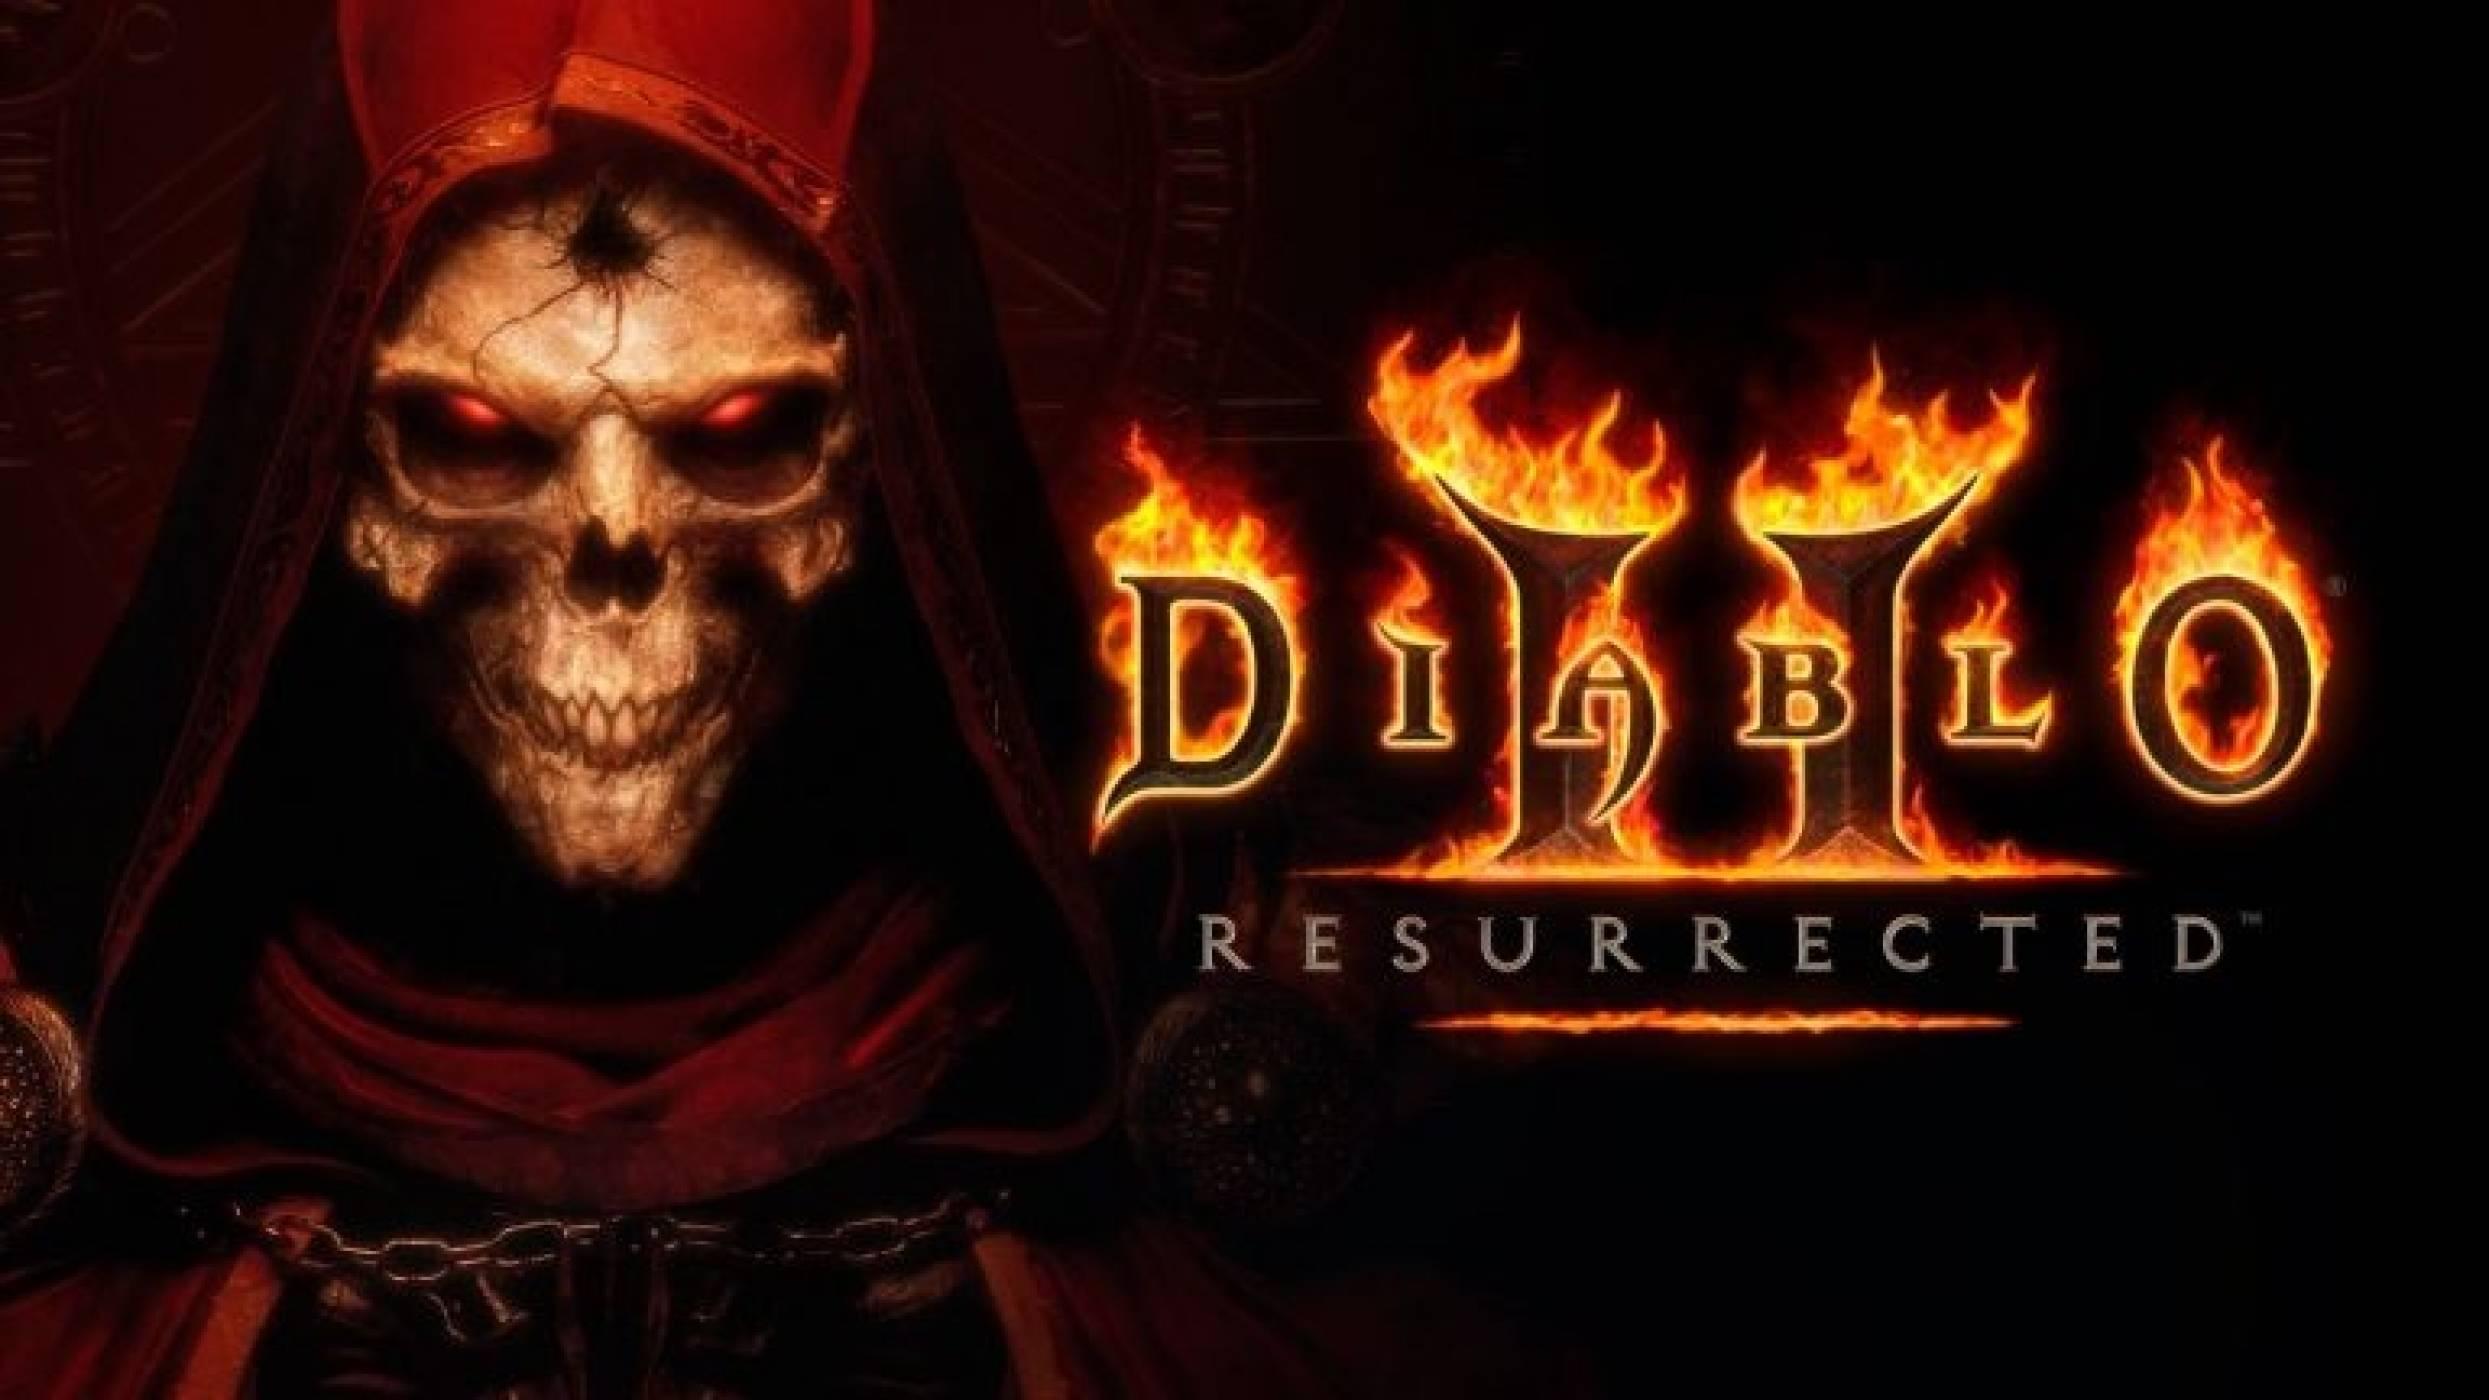 Diablo 2 Resurrected ще ползва уникалните характеристики на PS5 контролера